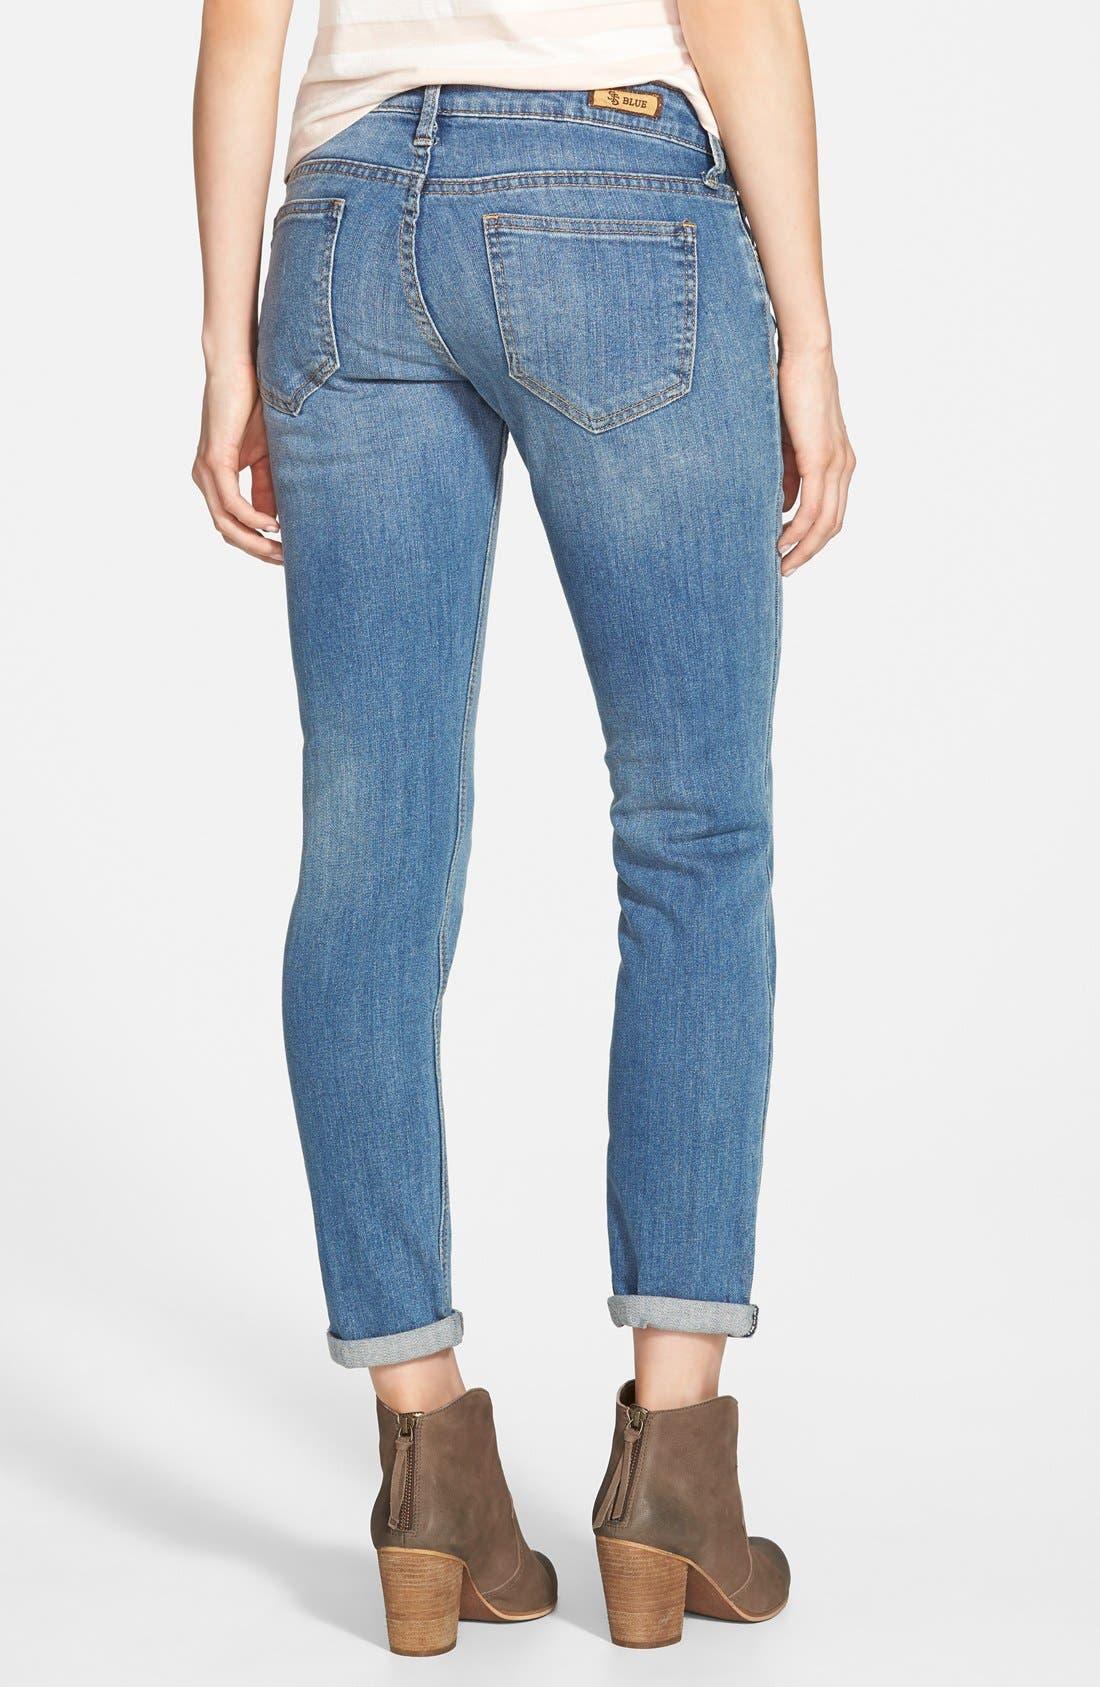 Alternate Image 2  - STS Blue 'Joey' Boyfriend Jeans (Medium Wash)